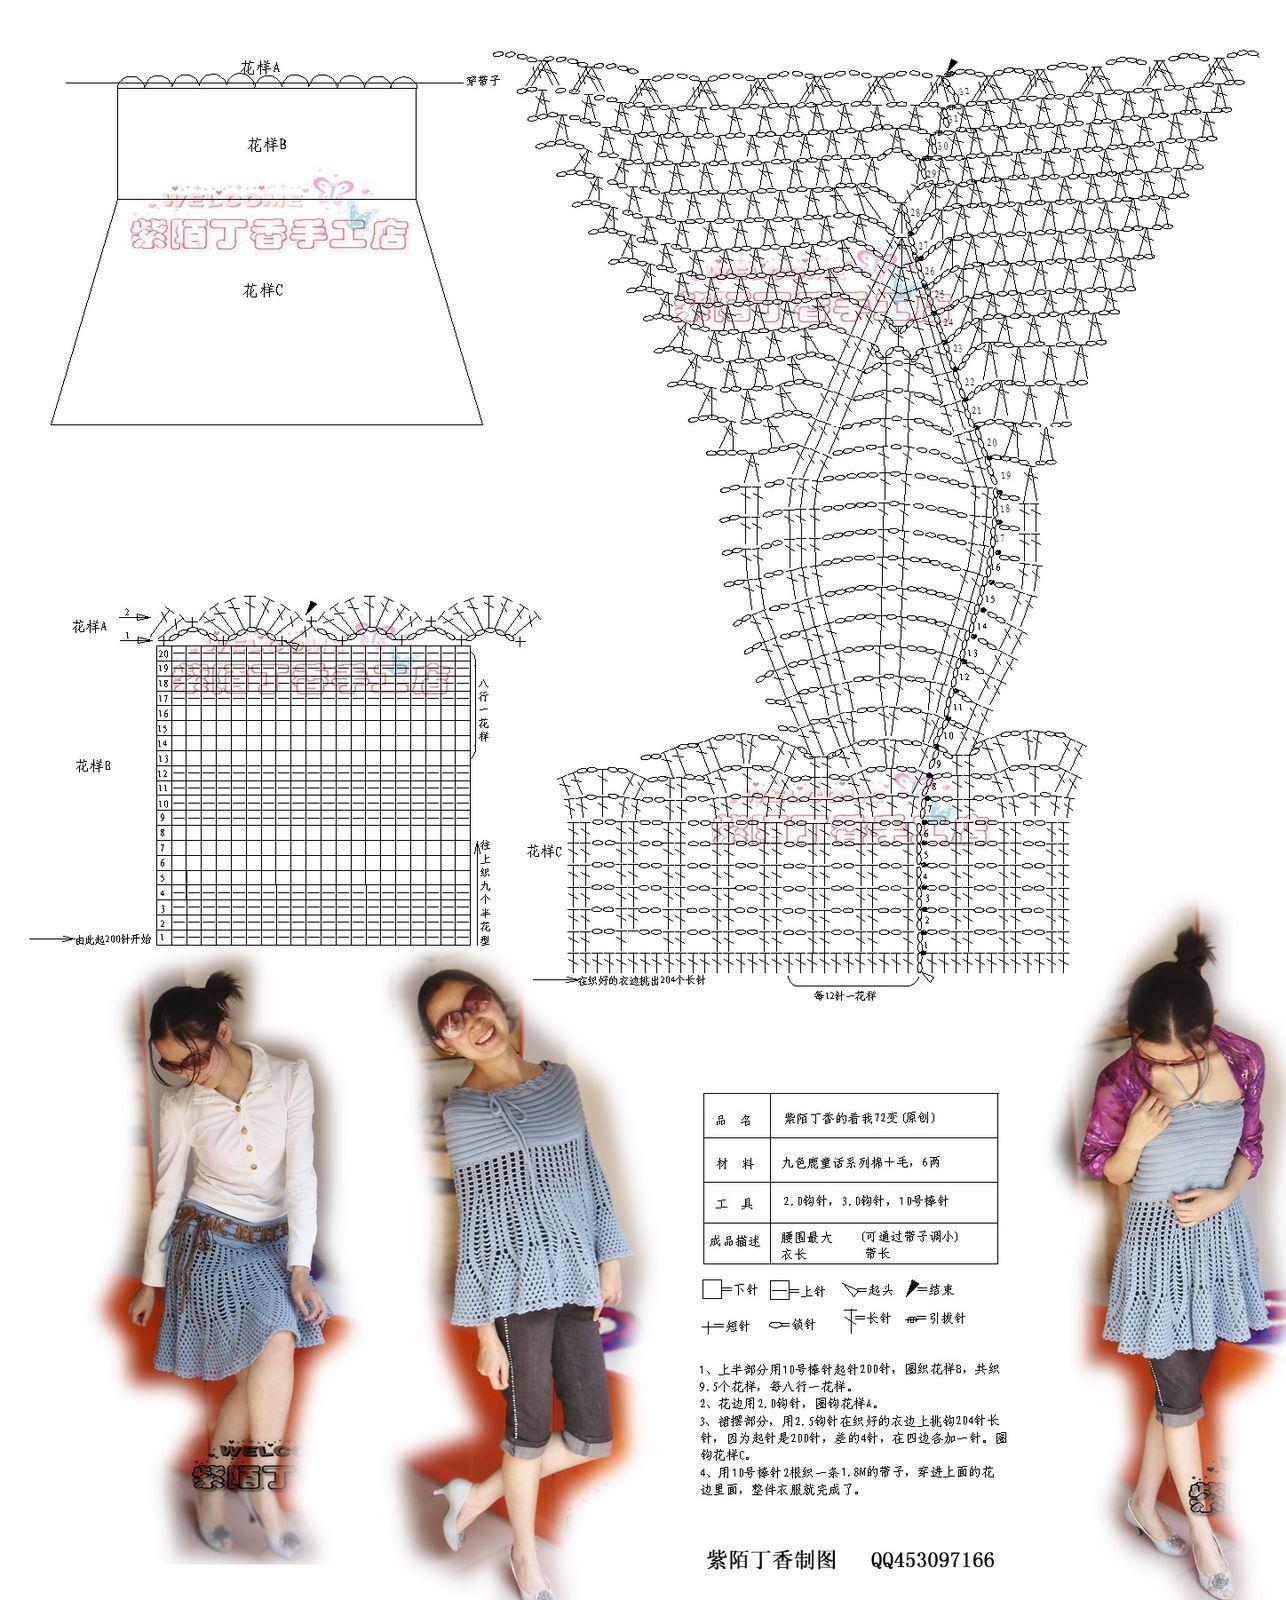 CARAMELO DE CROCHET: falda en crochet   Crochet   Pinterest   Faldas ...